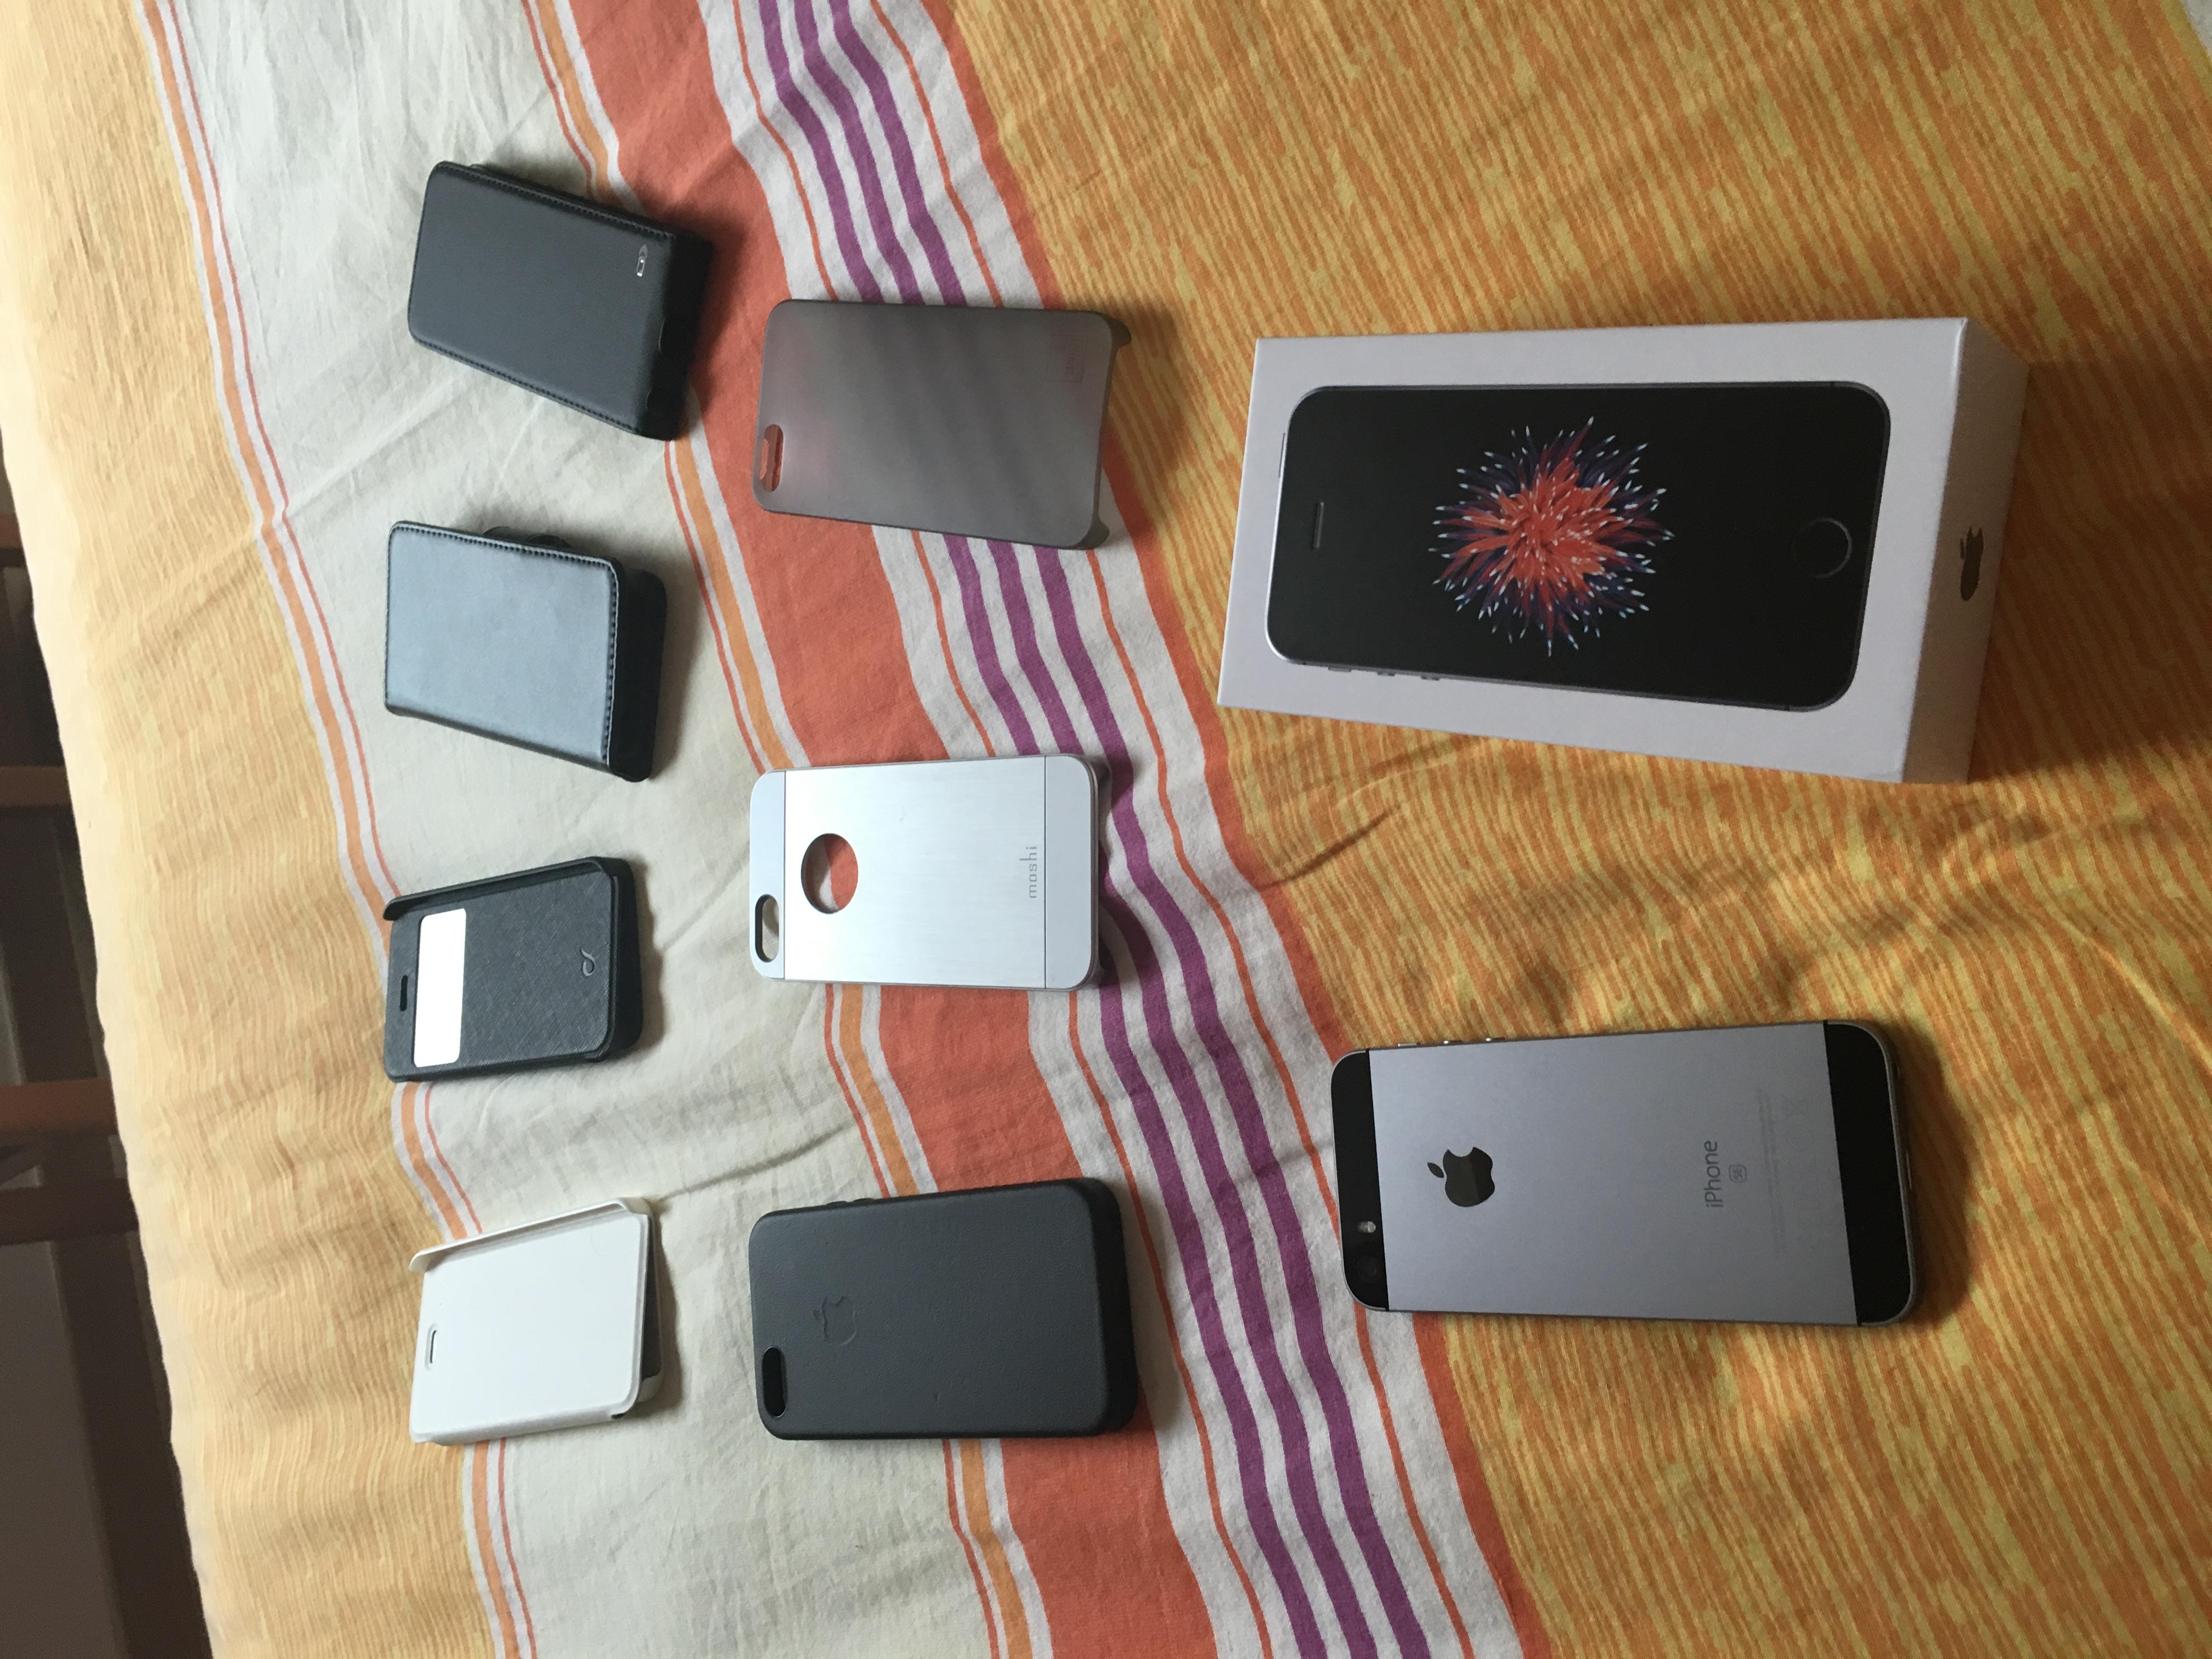 iphone se 64go neuf iphone 64go se neuf dans sa bo te originale groupon apple iphone se 64go. Black Bedroom Furniture Sets. Home Design Ideas